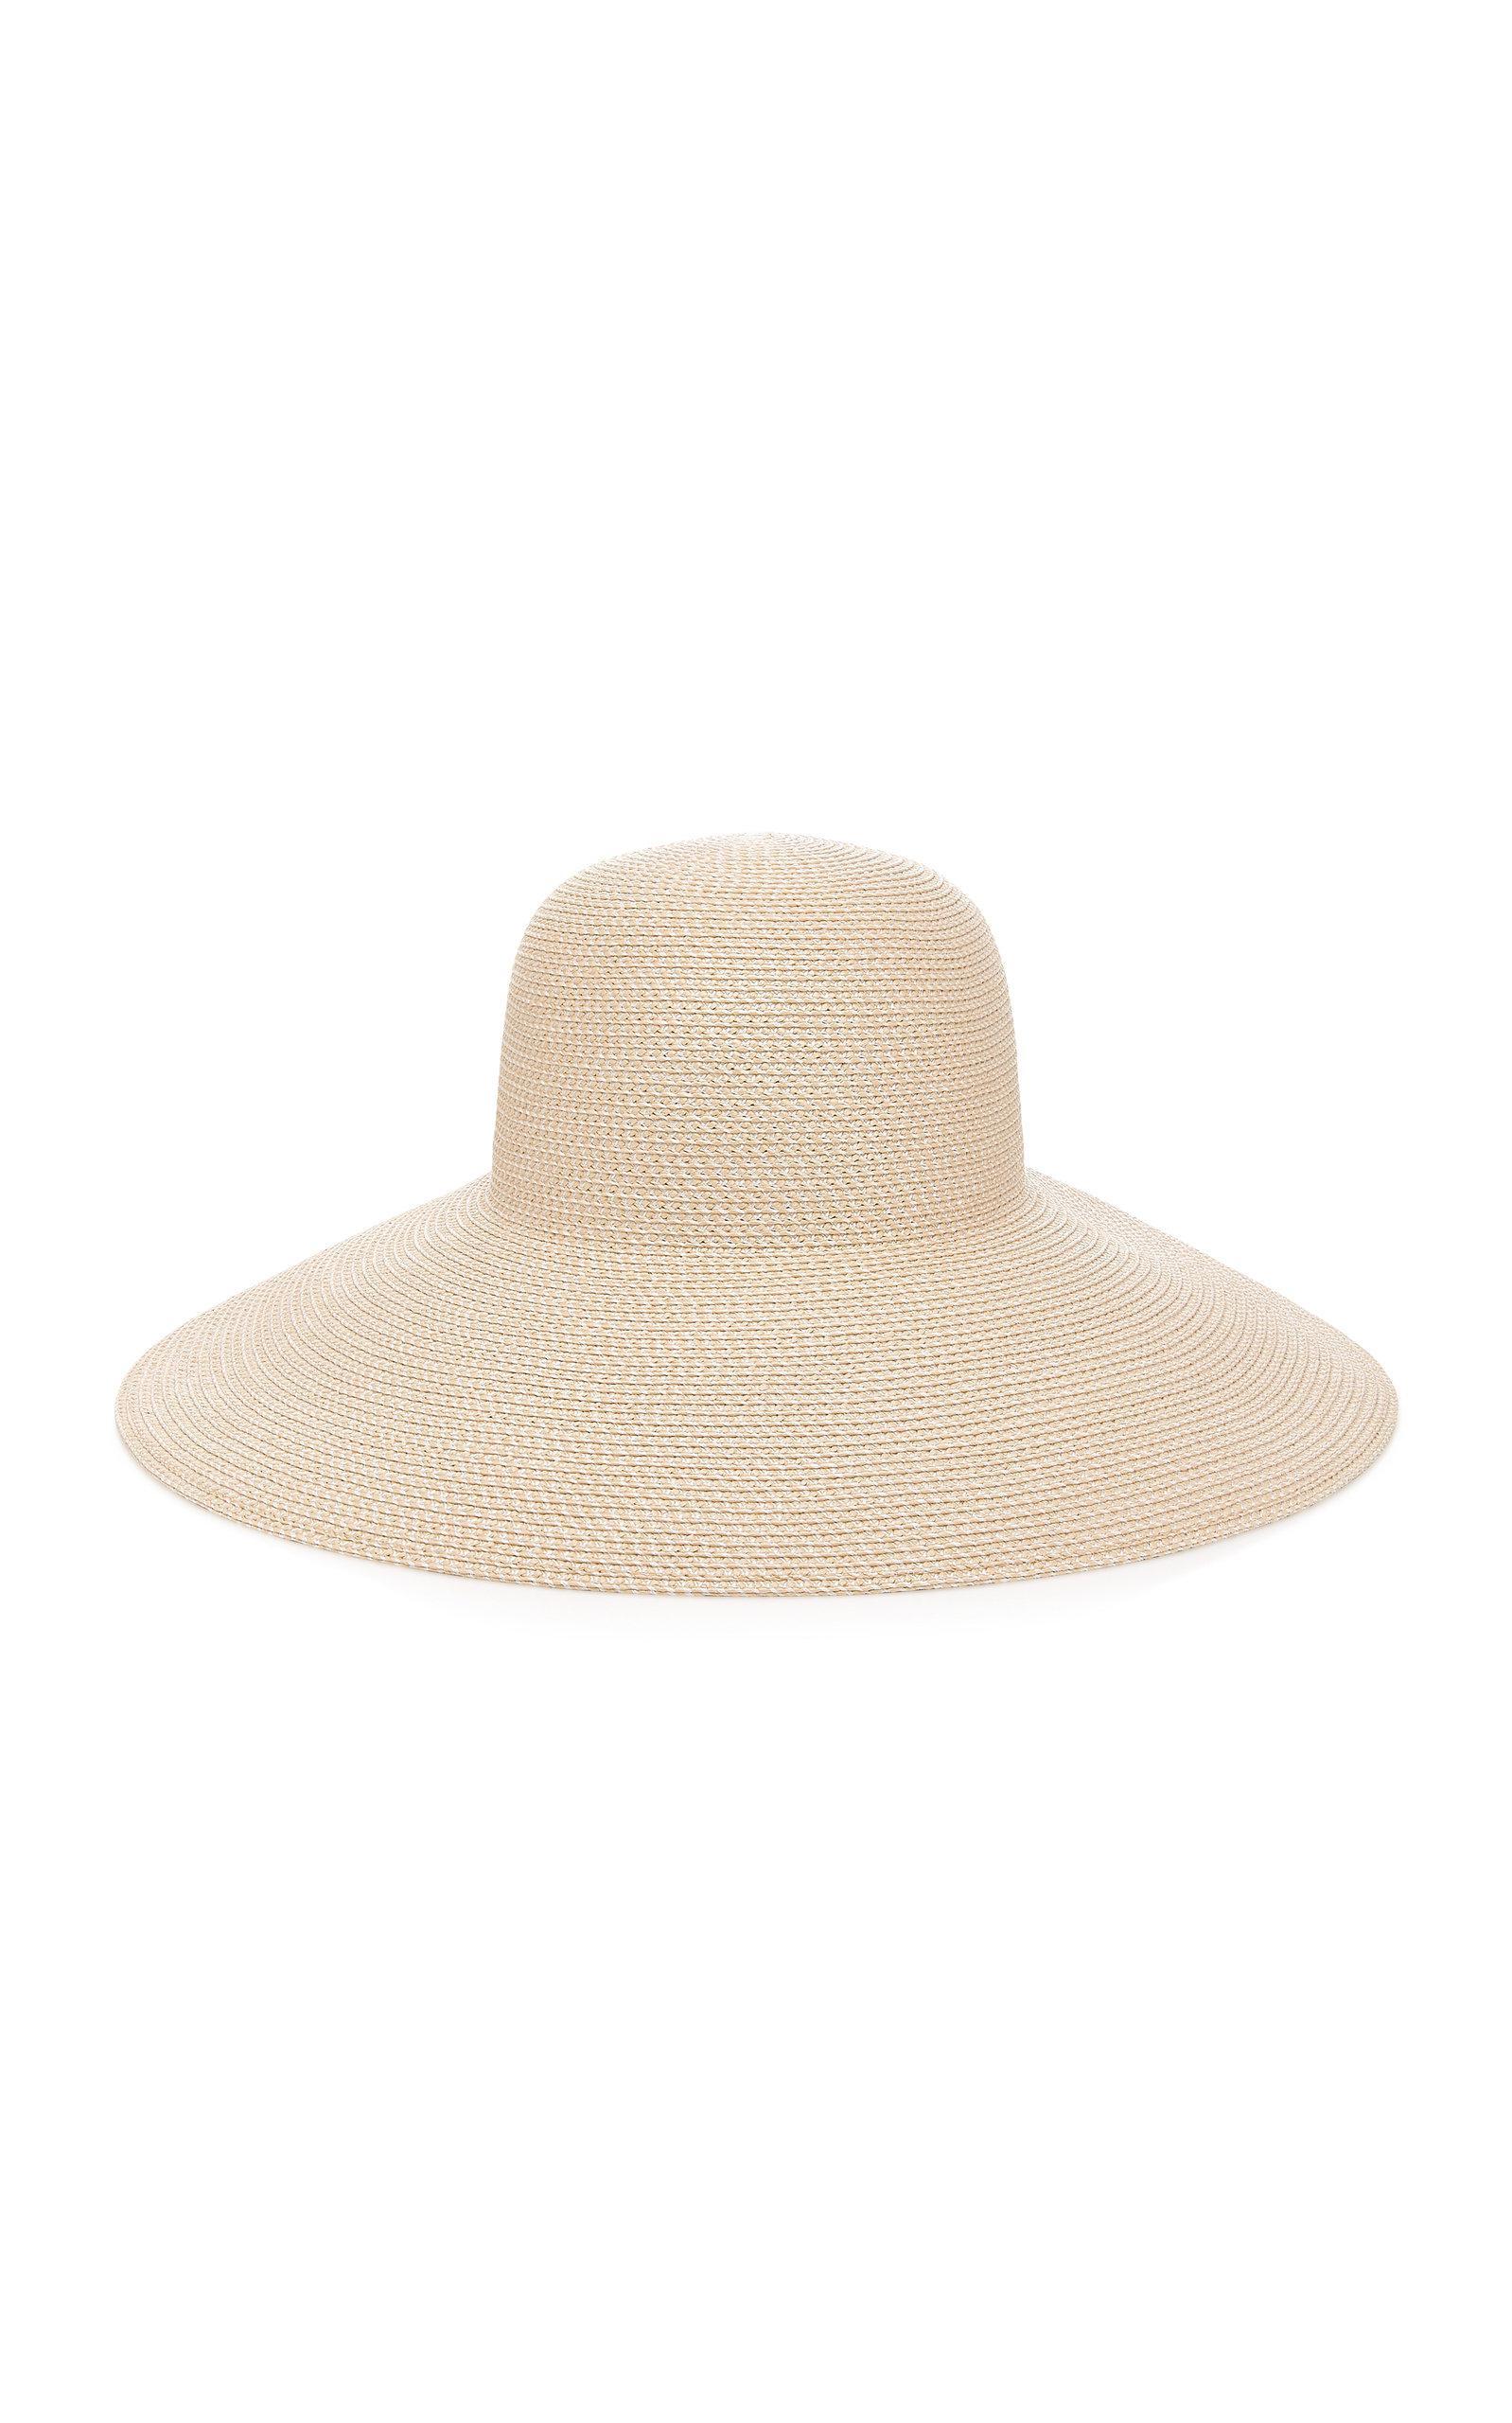 Lyst - Eric Javits Bella Woven Sun Hat in White 375068578b2